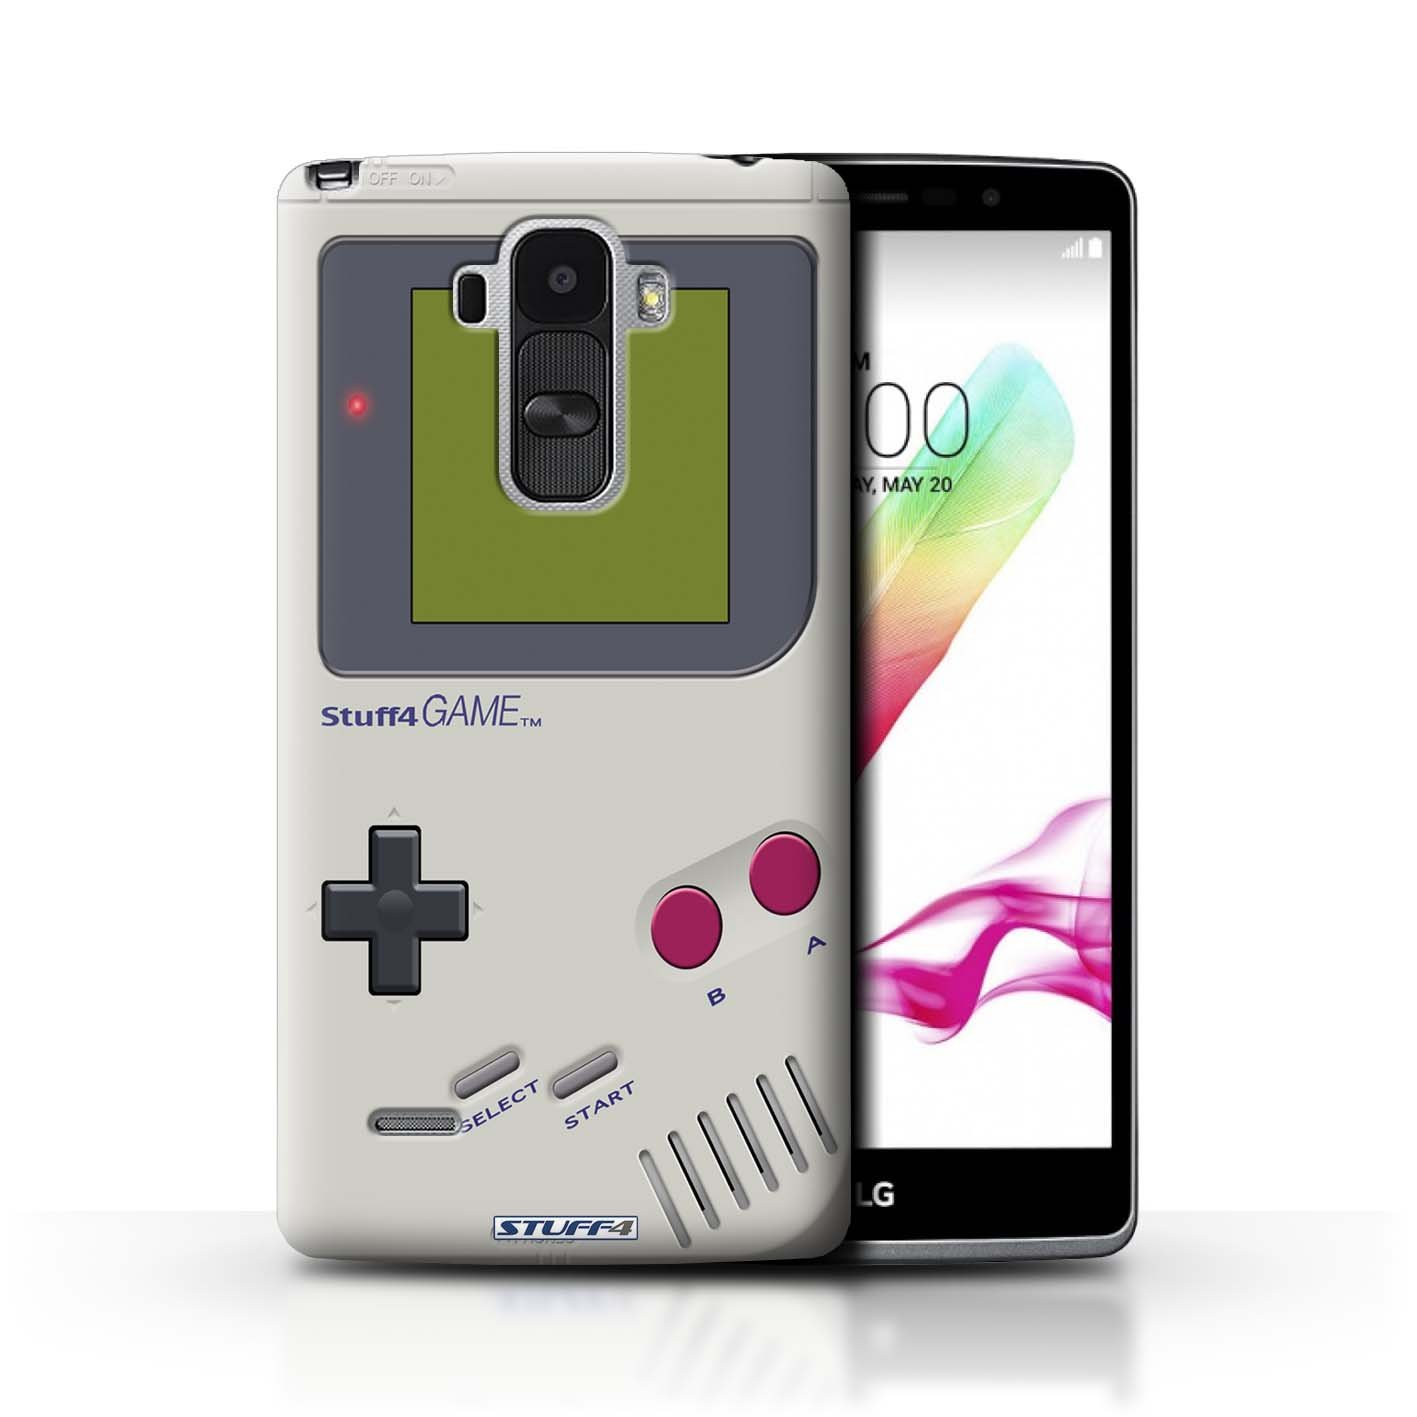 Stuff4® Carcasa/Funda Dura para el LG G4 Stylus/Serie ...